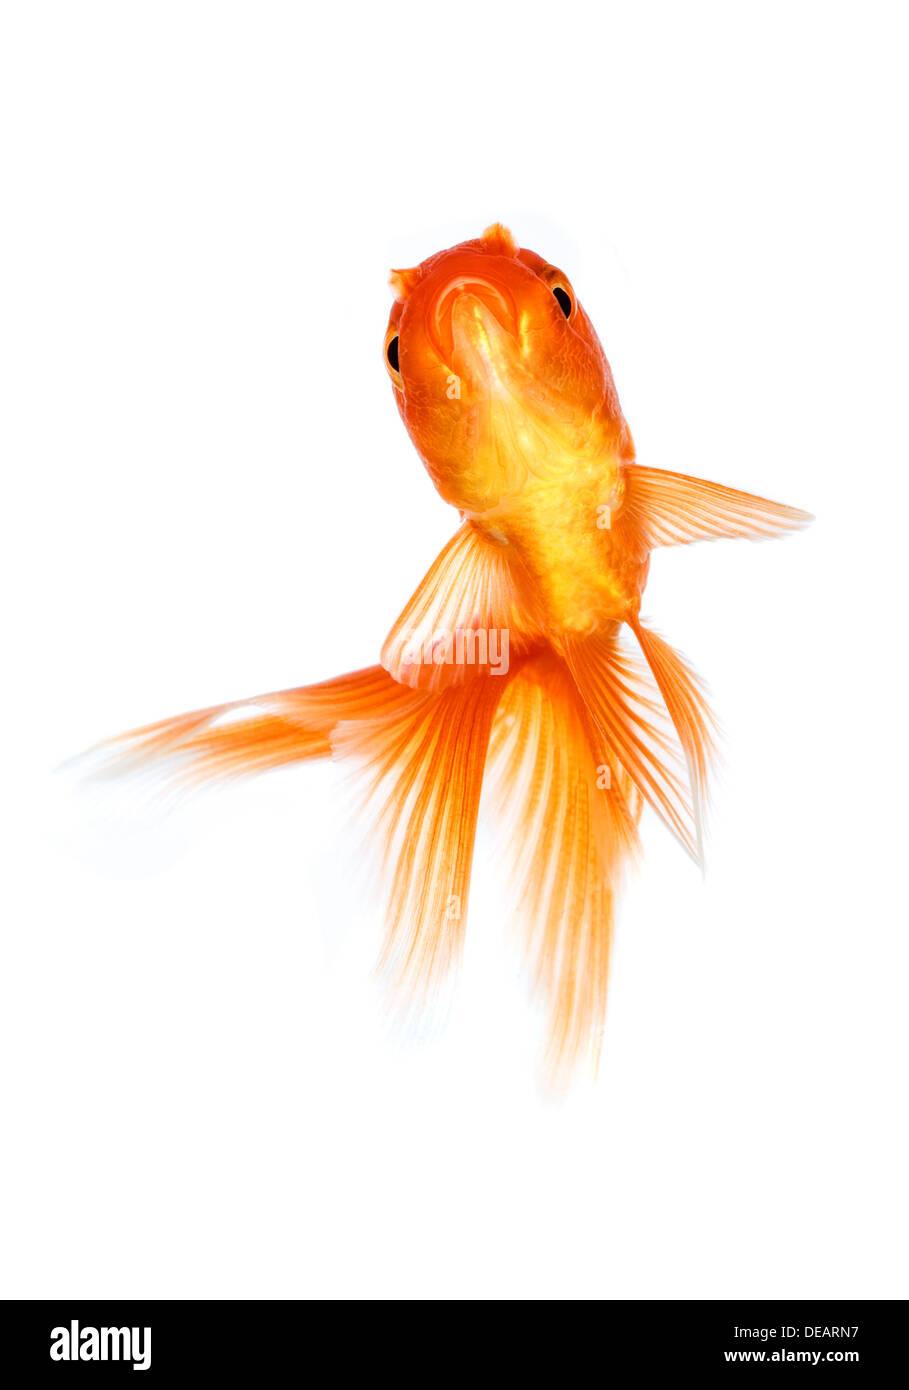 poisson rouge isol sur fond blanc banque d 39 images photo stock 60474435 alamy. Black Bedroom Furniture Sets. Home Design Ideas